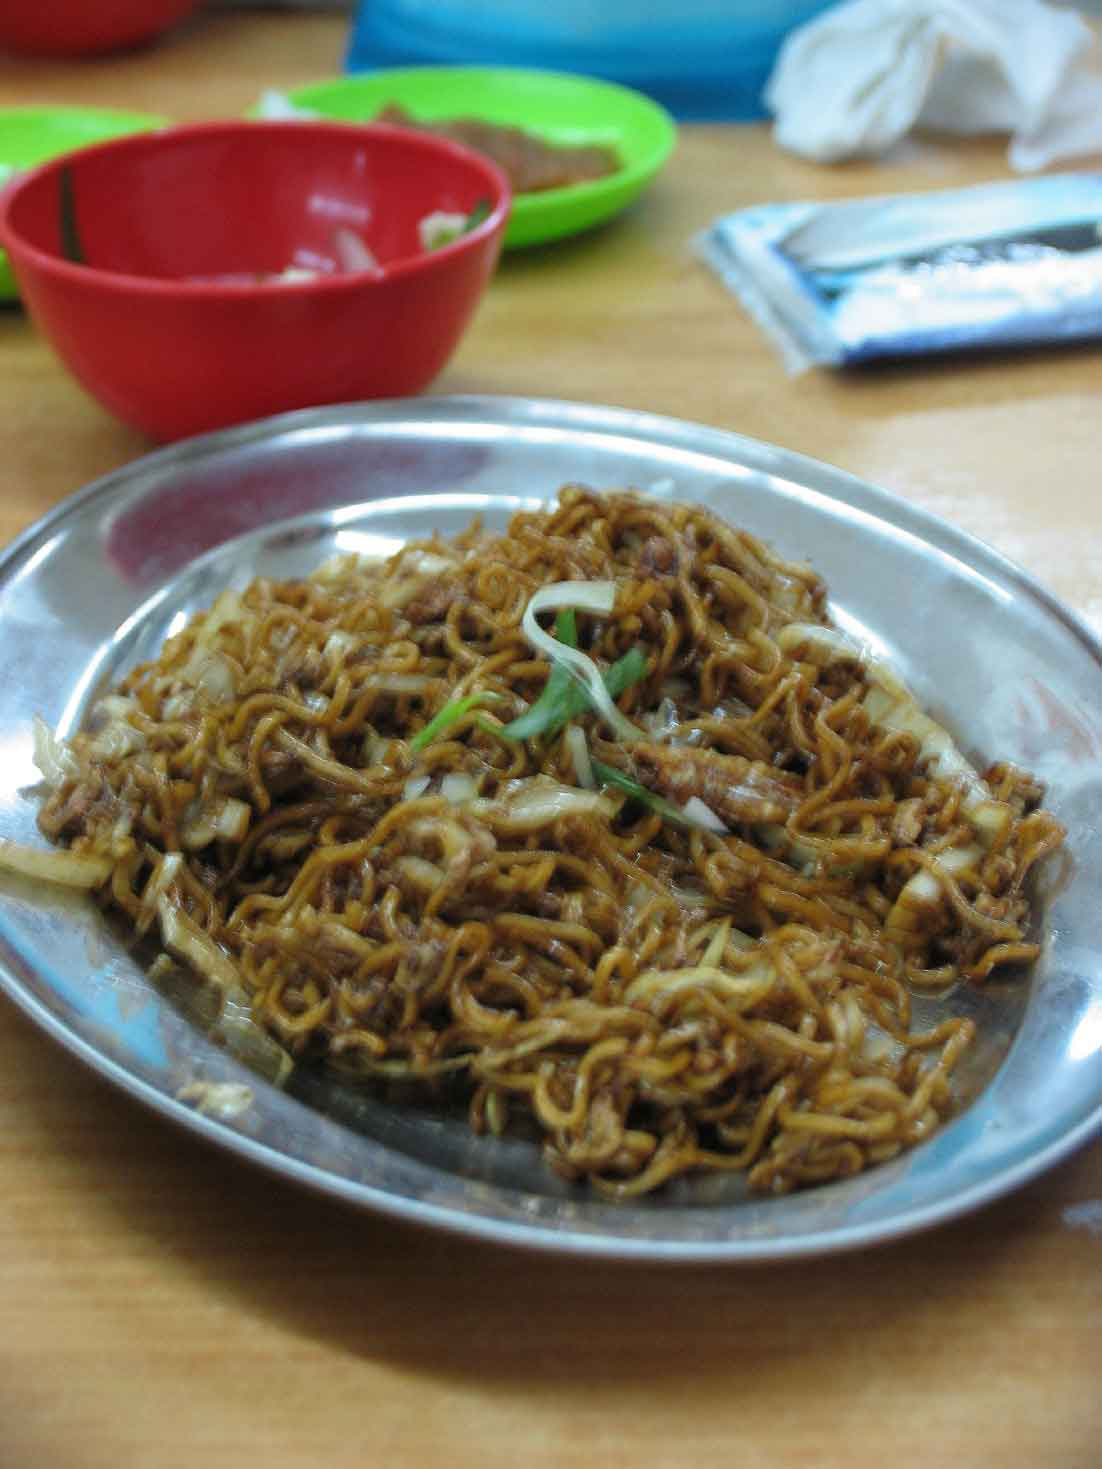 Terubong Seafood fried maggi mee